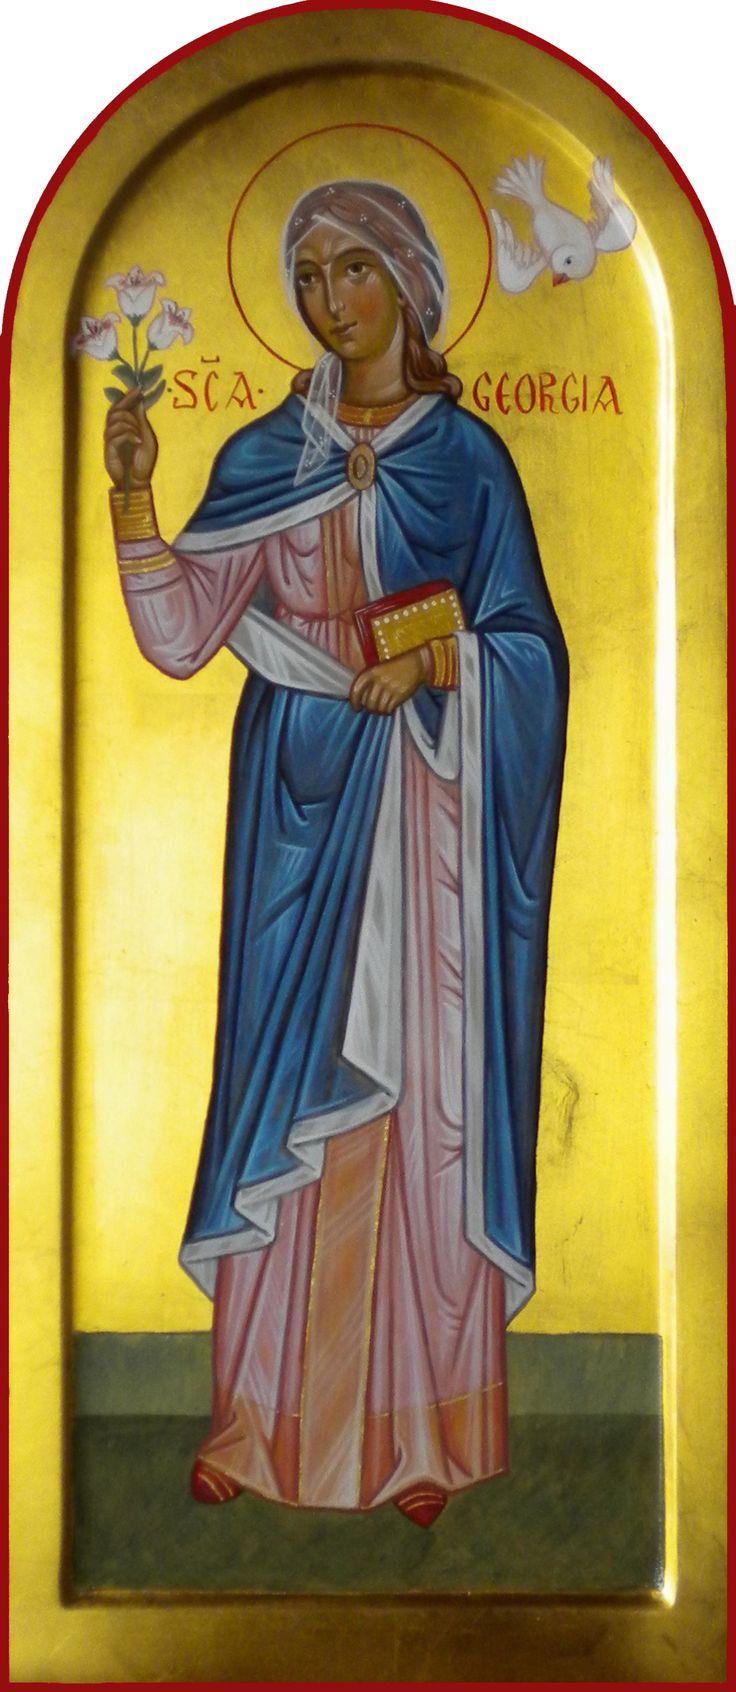 Santa Giorgia per mano di Giuseppe Bottione (Italy)